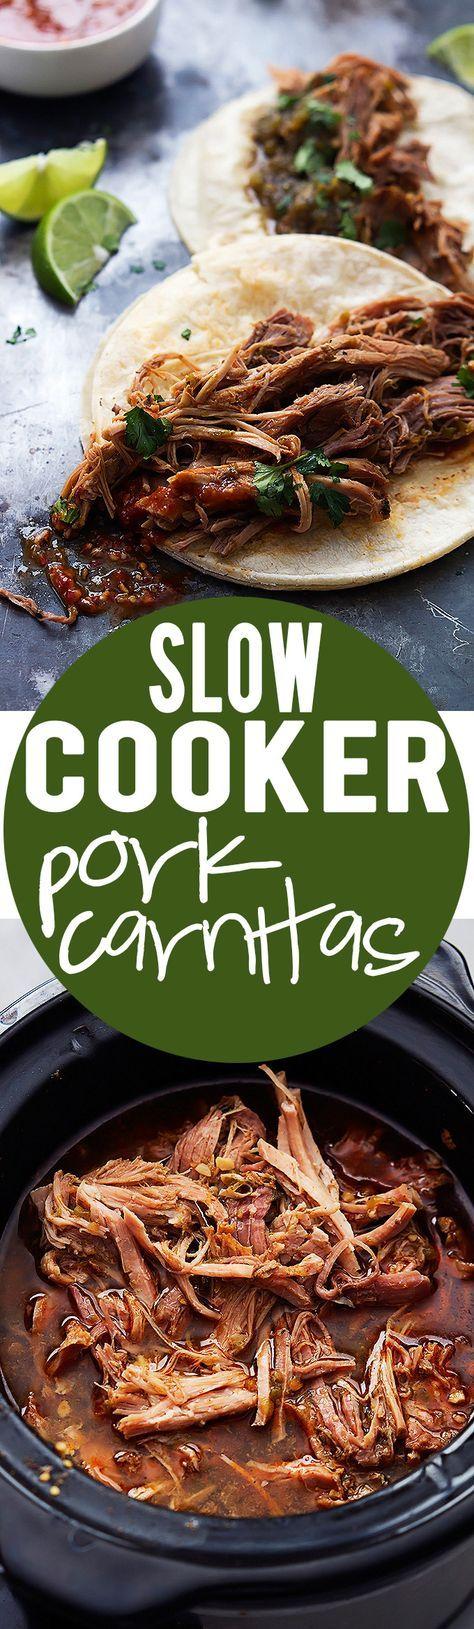 Slow Cooker Pork Carnitas   Creme de la Crumb